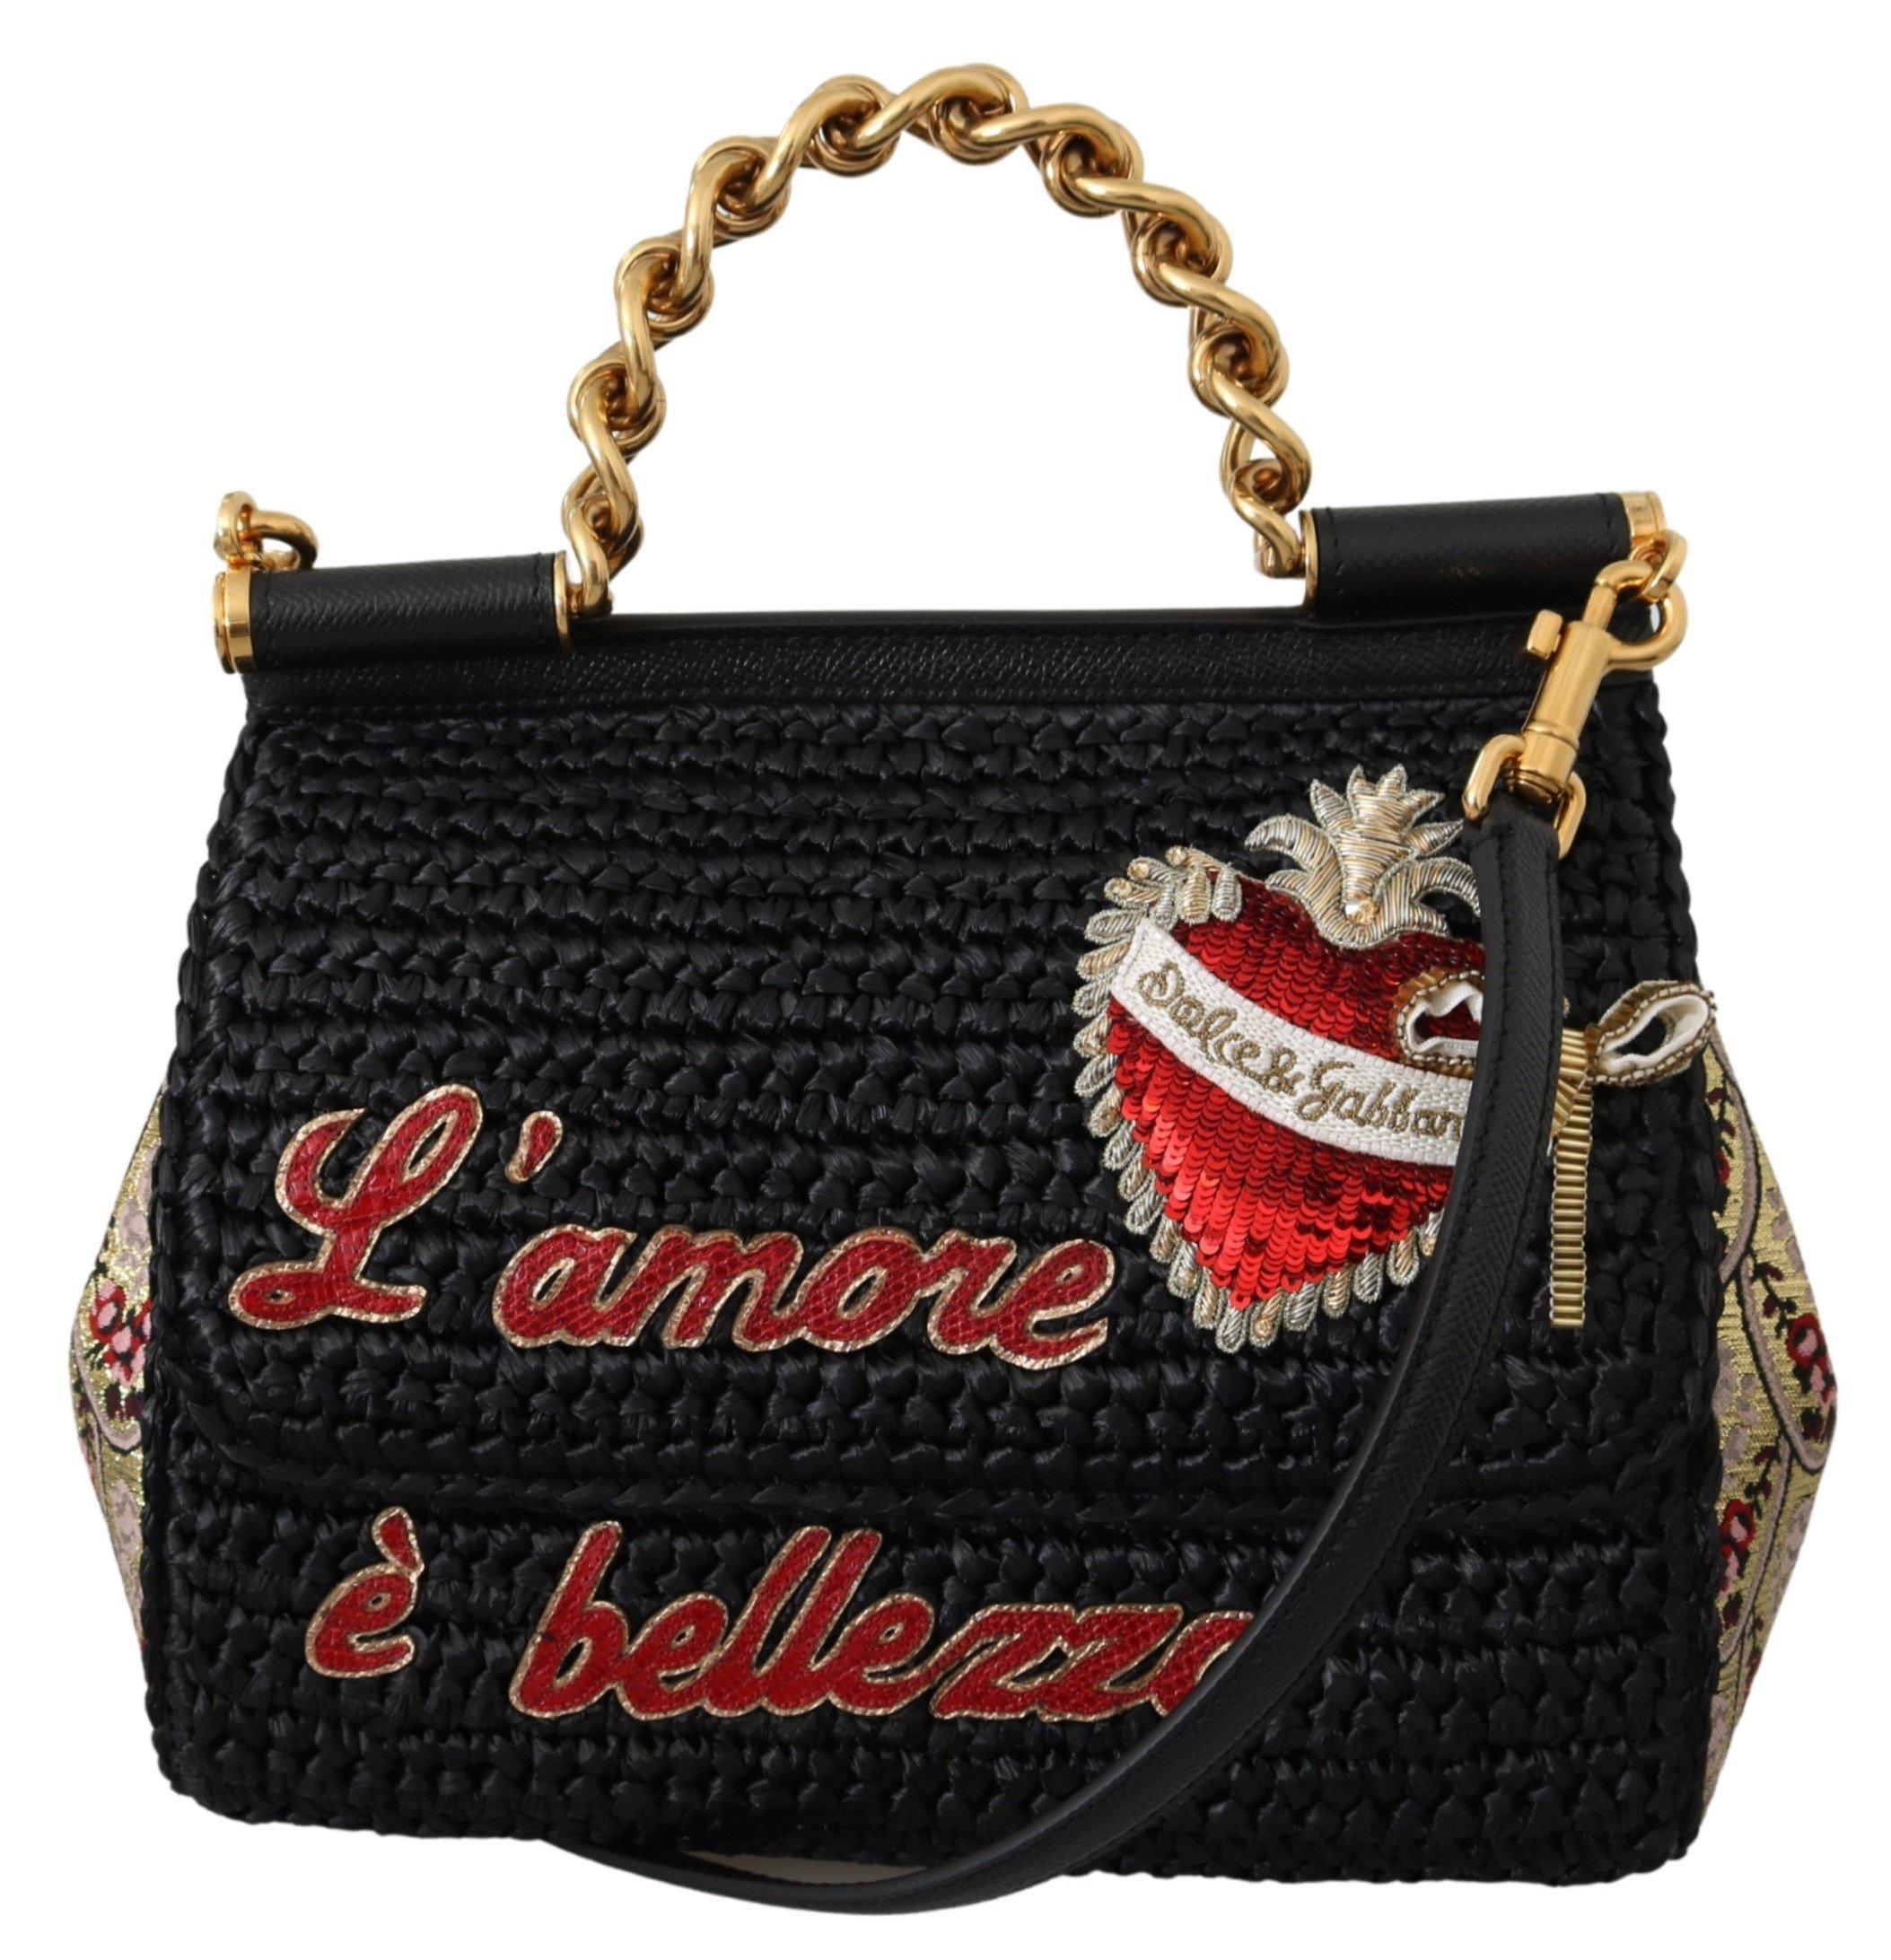 Dolce & Gabbana Women's Raffia L'amore e Bellezza Shoulder Bag Black VAS9842